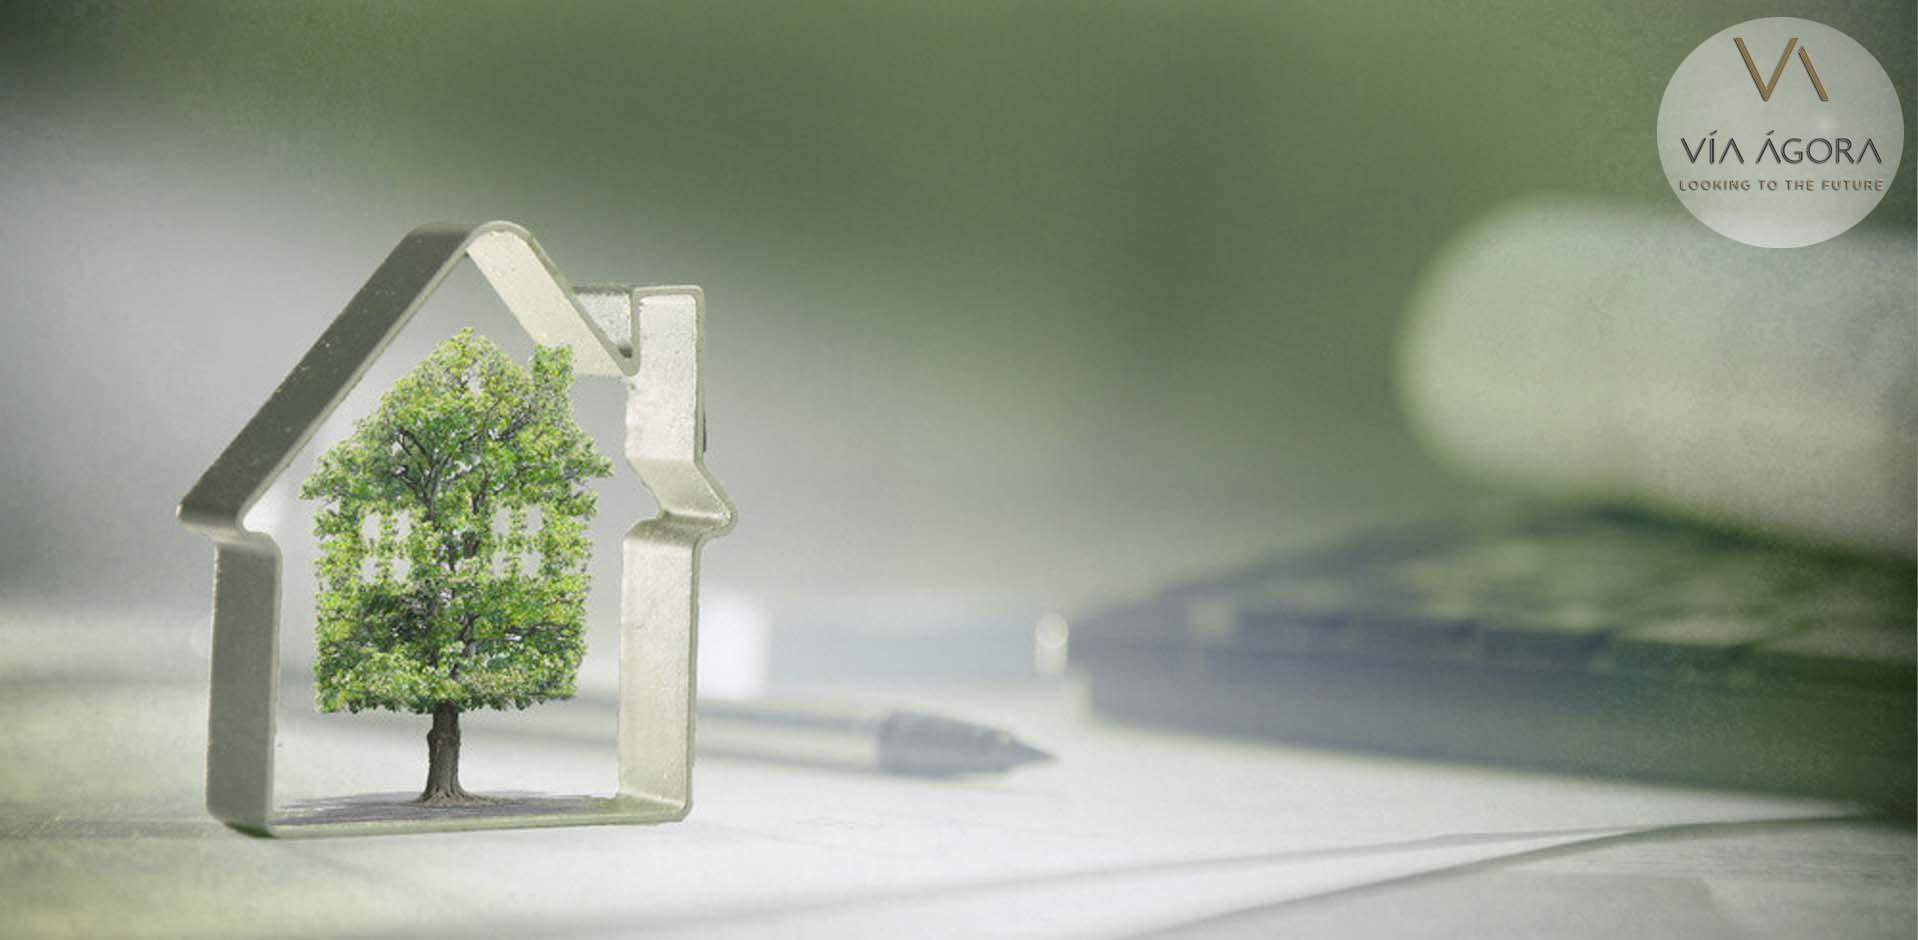 via agora - promotora inmobiliaria- industrializacion viviendas - 3